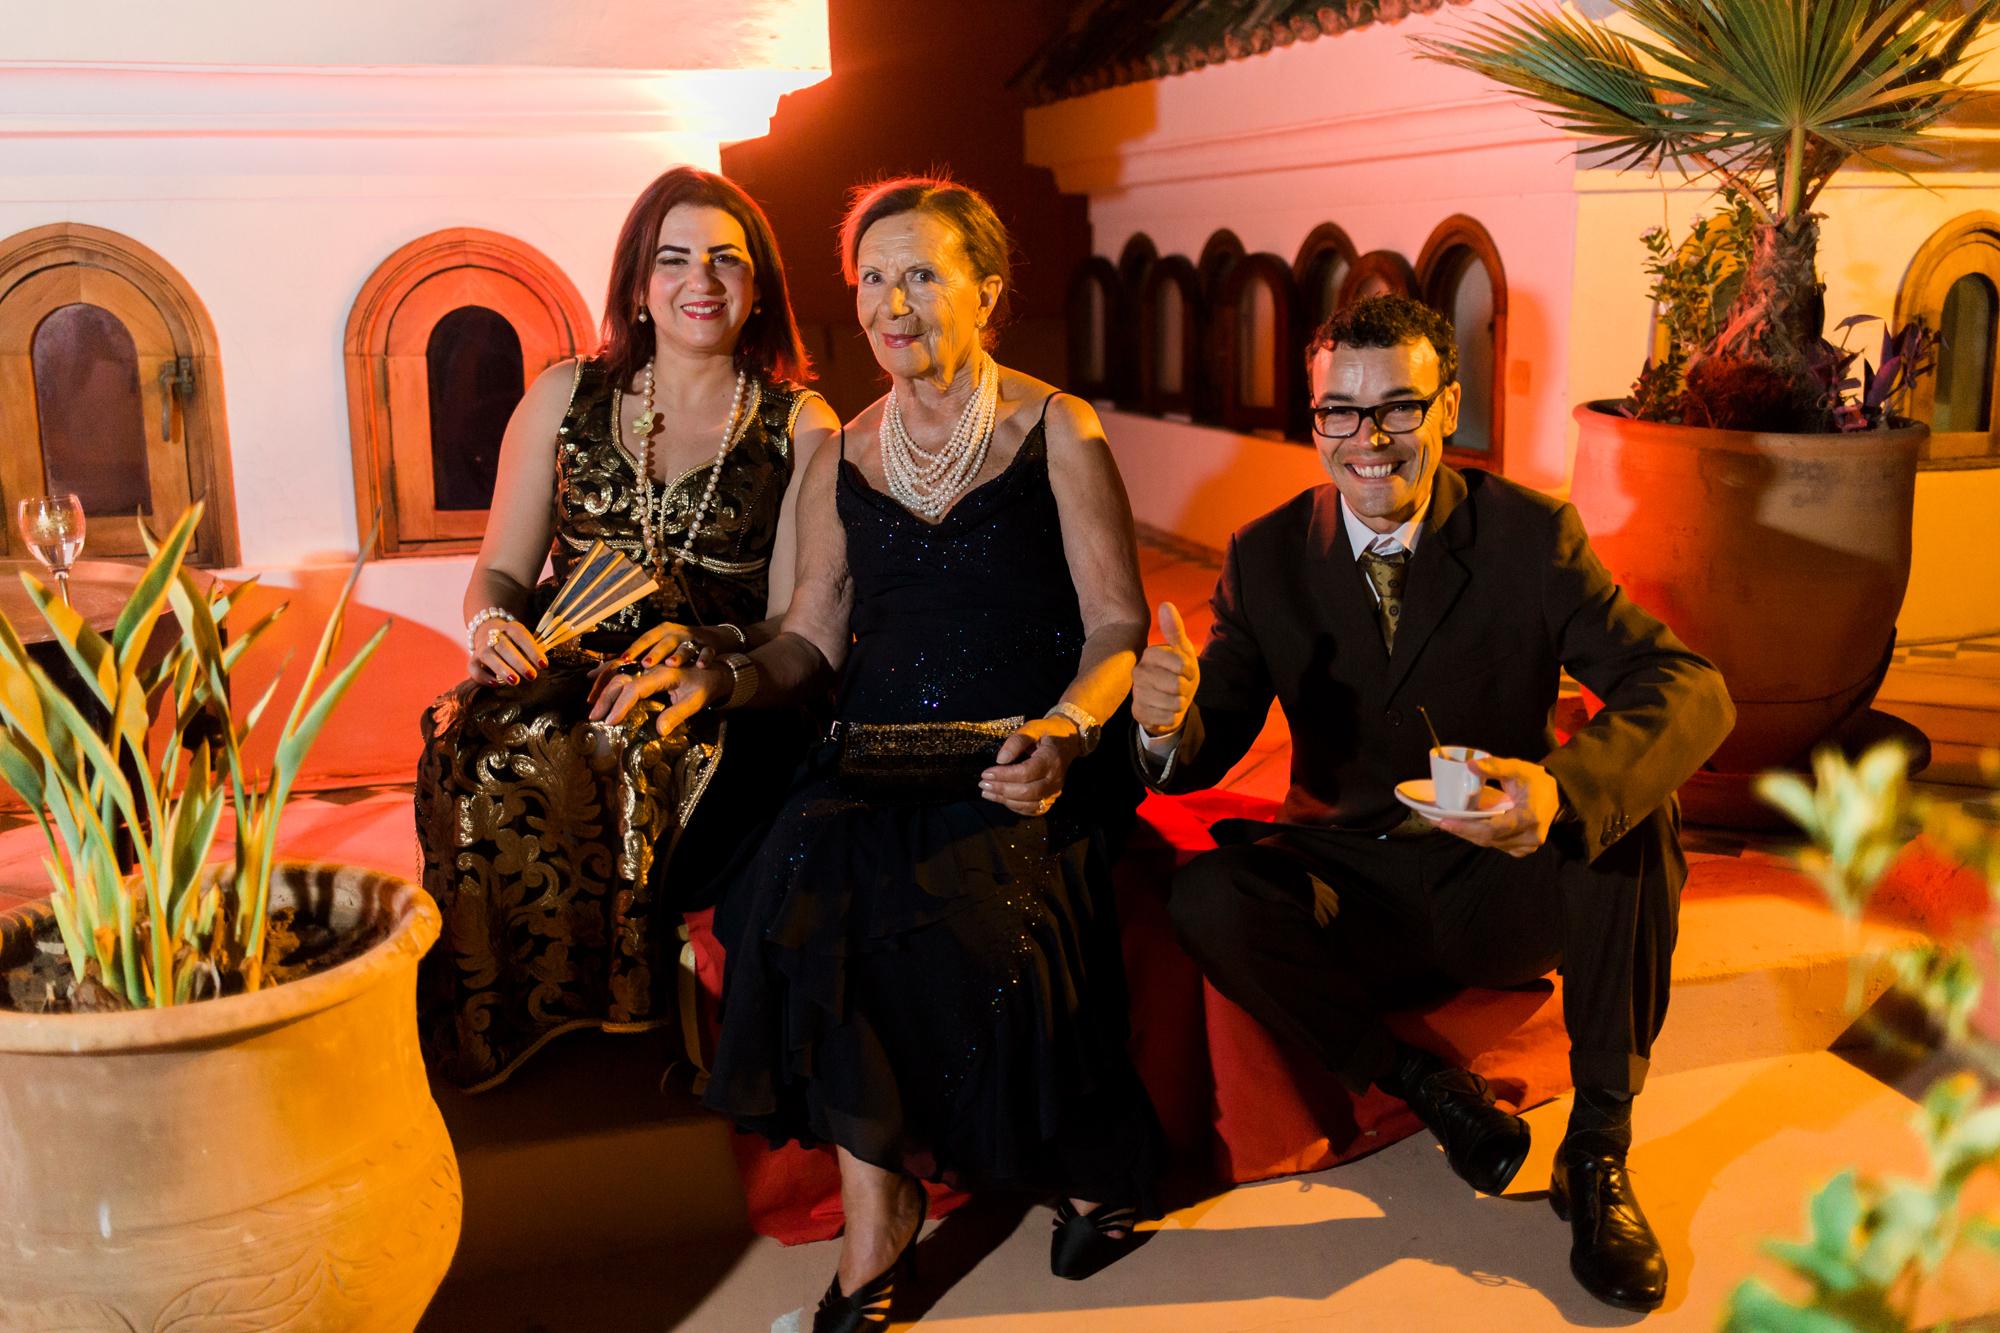 marrakech-morocco-destination-wedding-lilouette-11.jpg